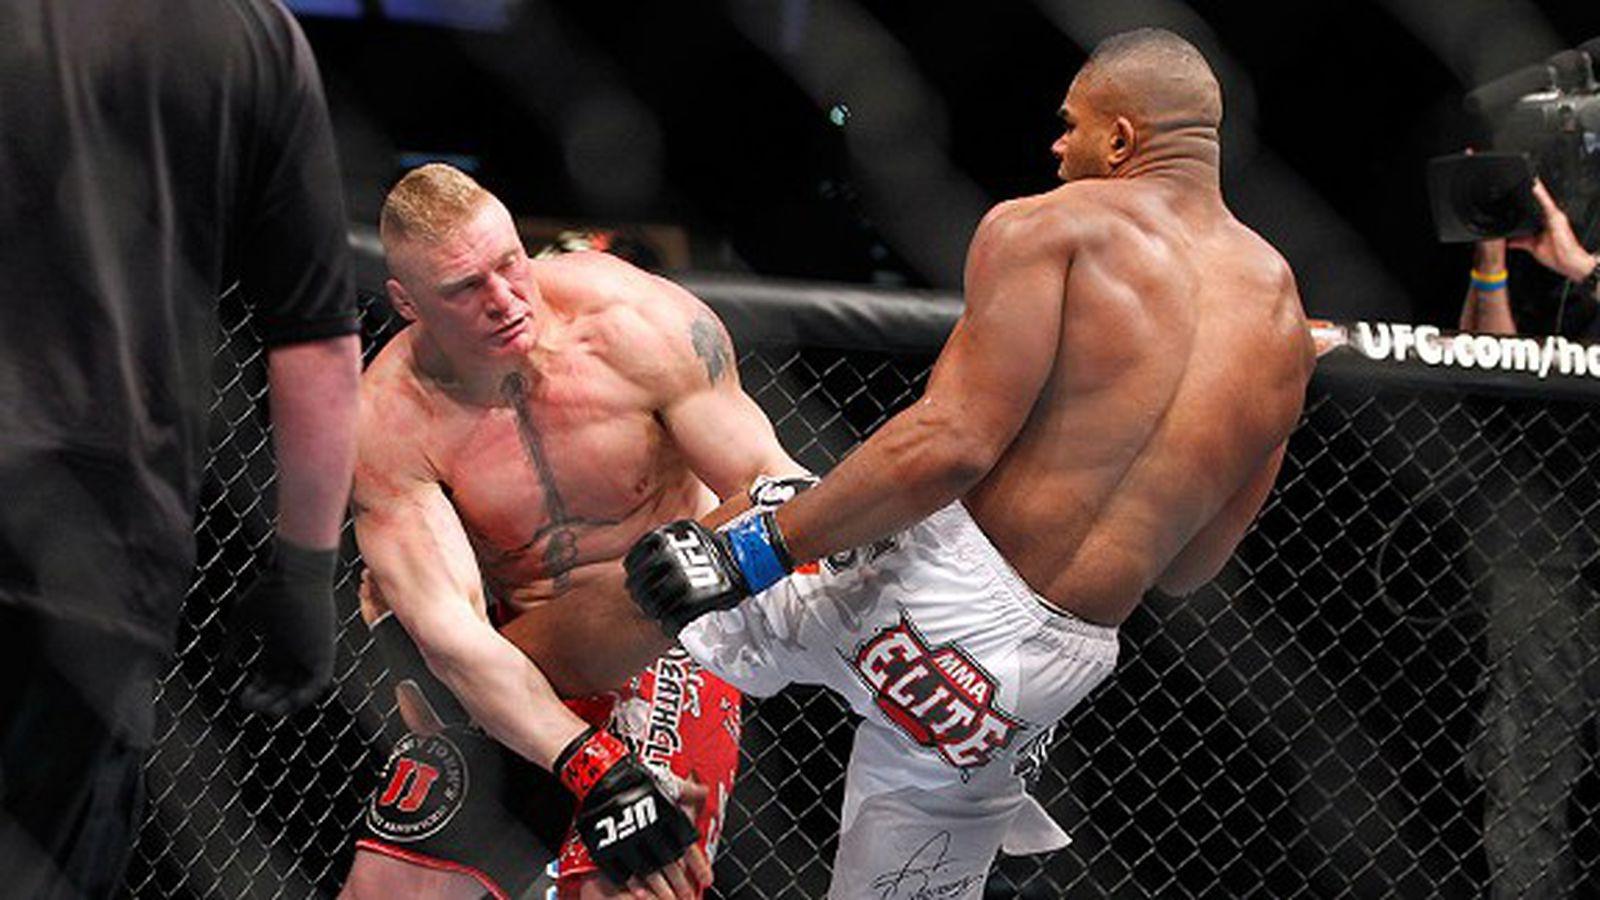 UFC 141 results recap: Brock Lesnar vs Alistair Overeem ...